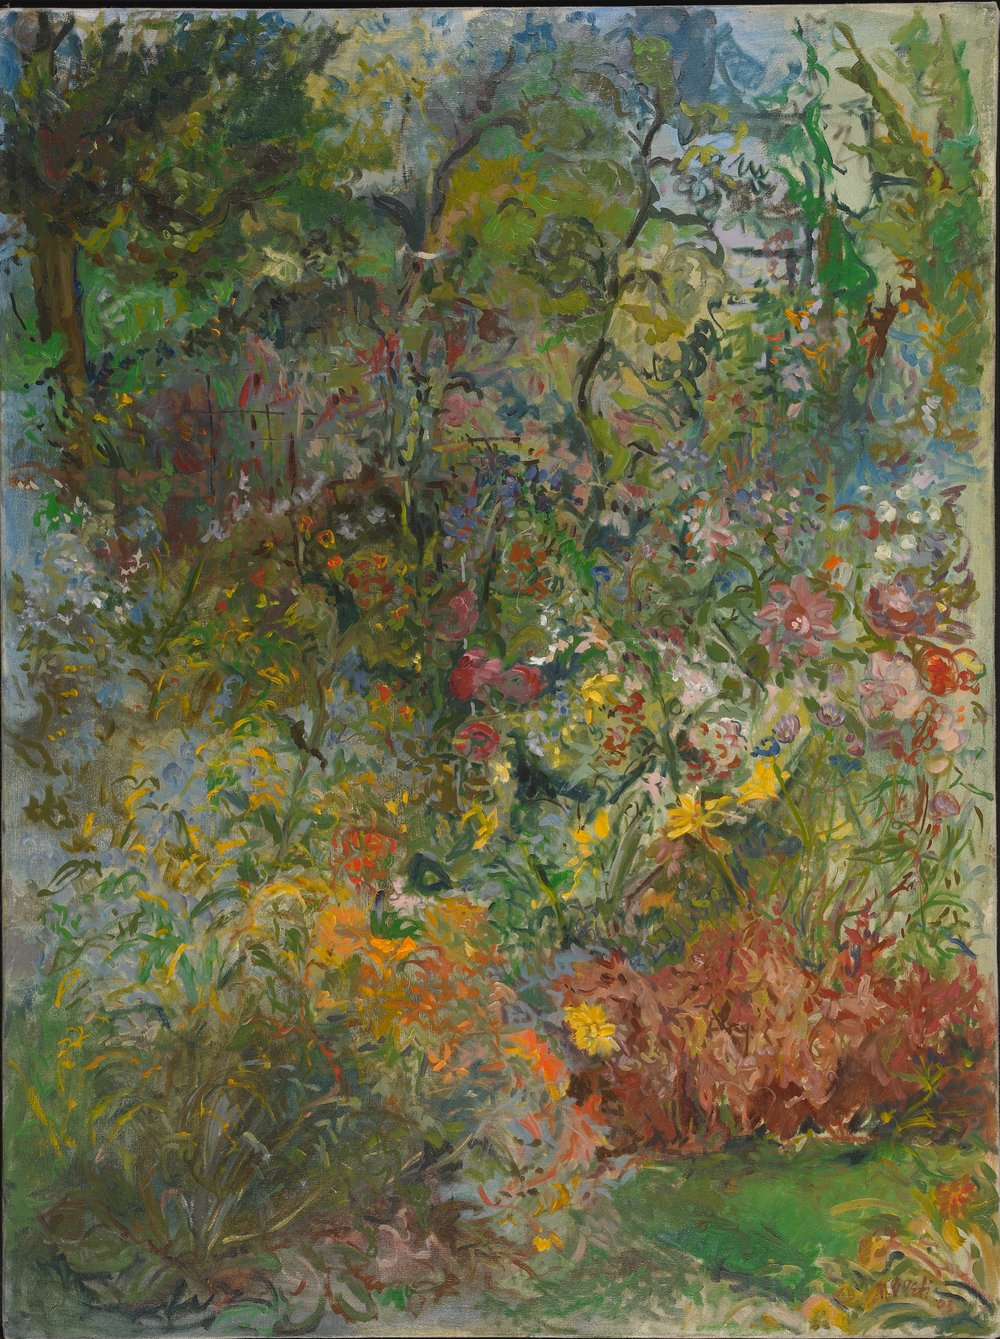 Garden near Woods  36X60 - Oil on Canvas